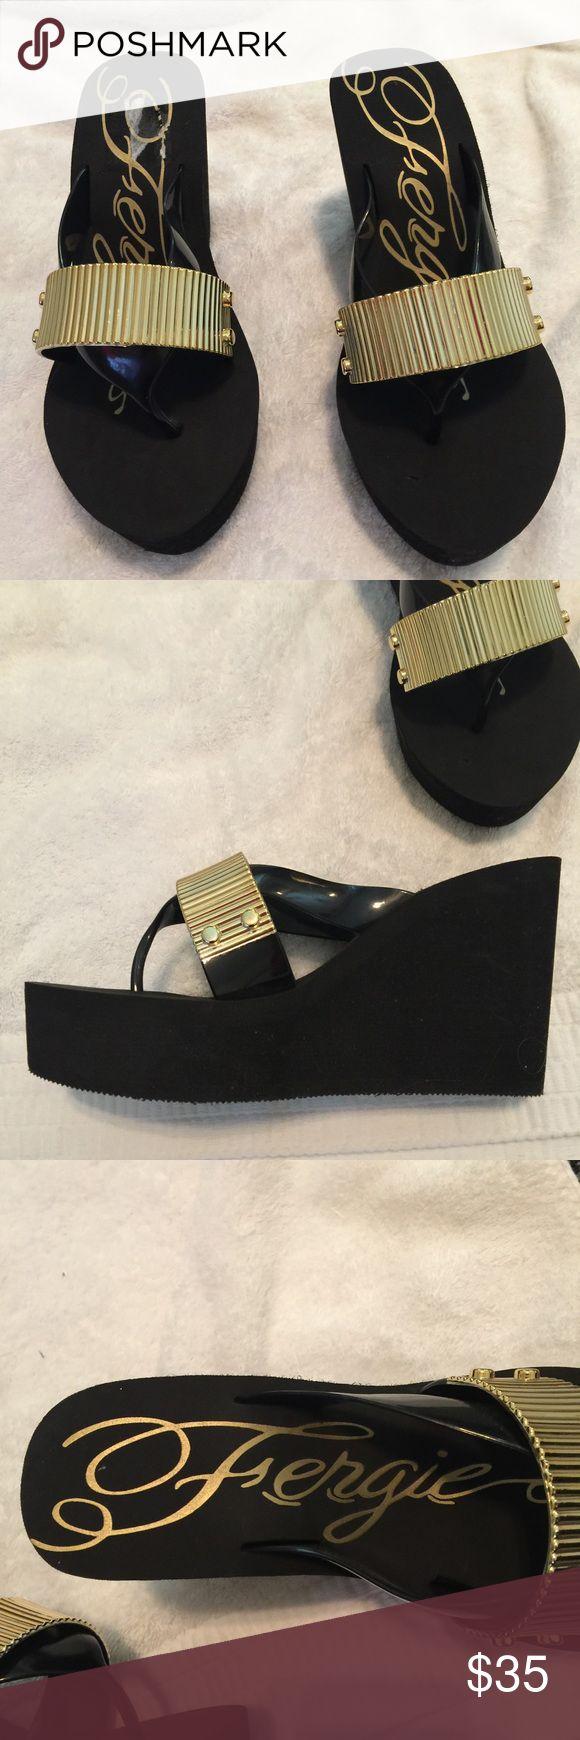 Fergie Sandals NWT Fergie Shoes Sandals